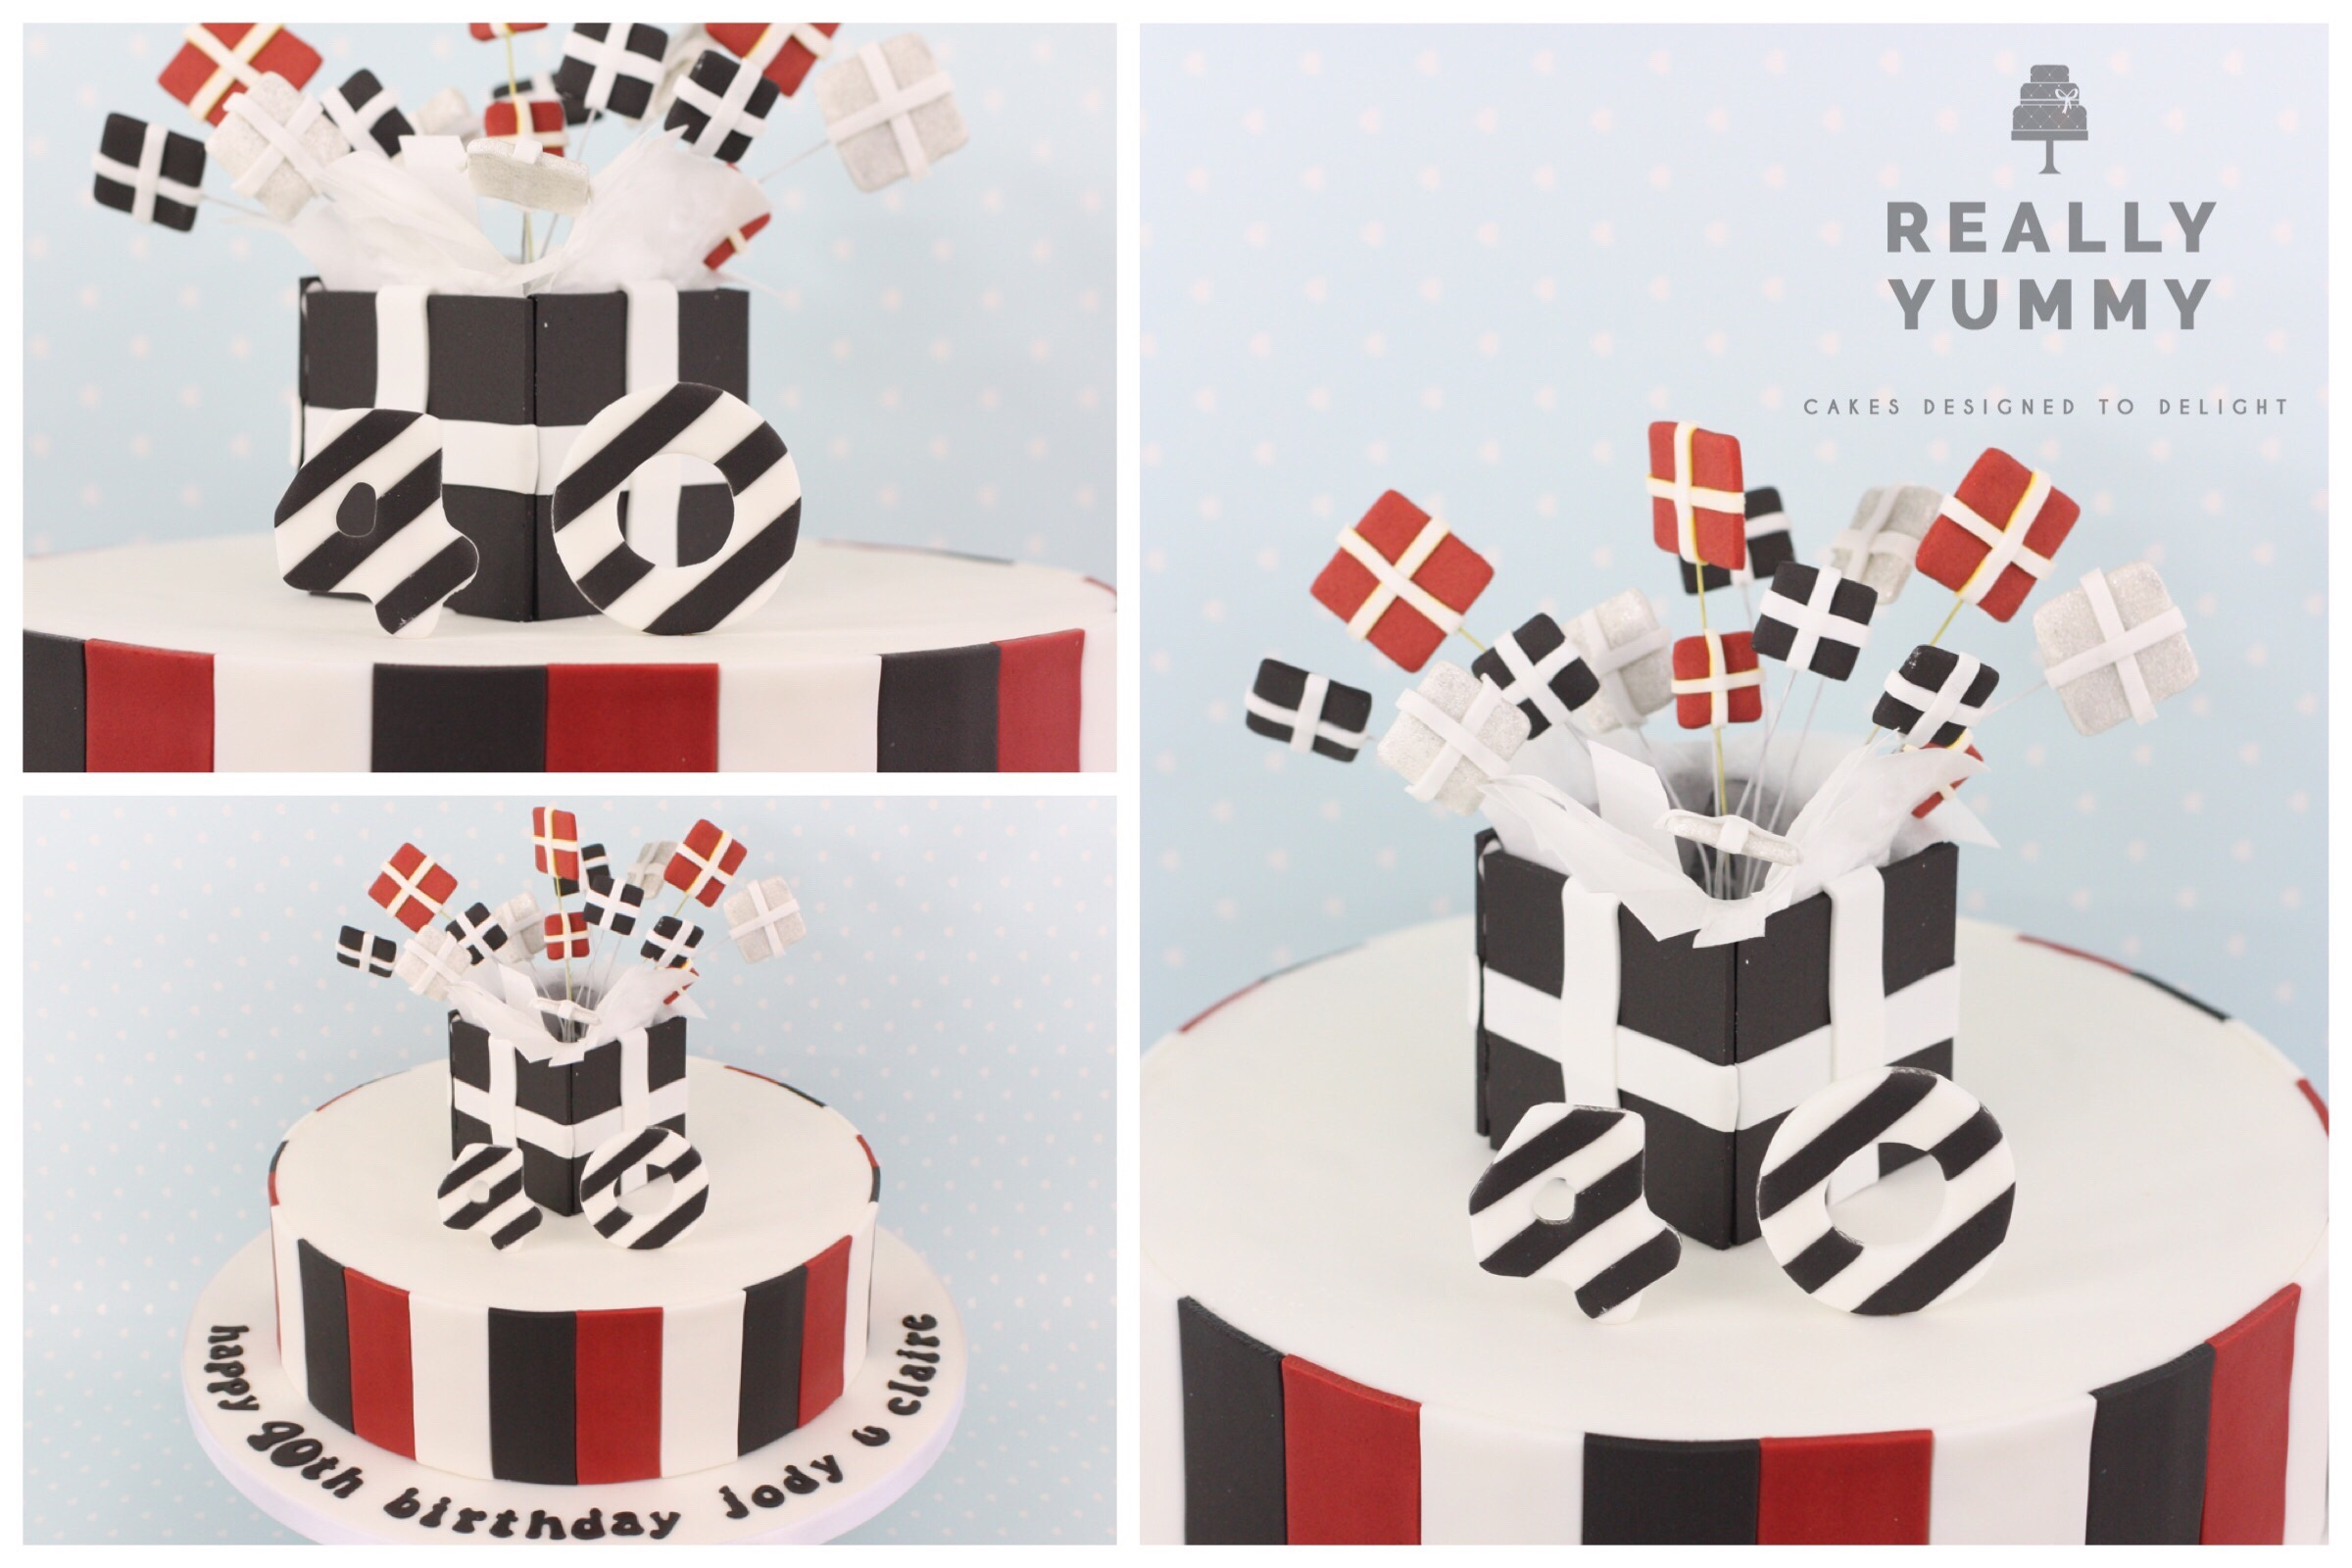 Present cake for 40th birthday